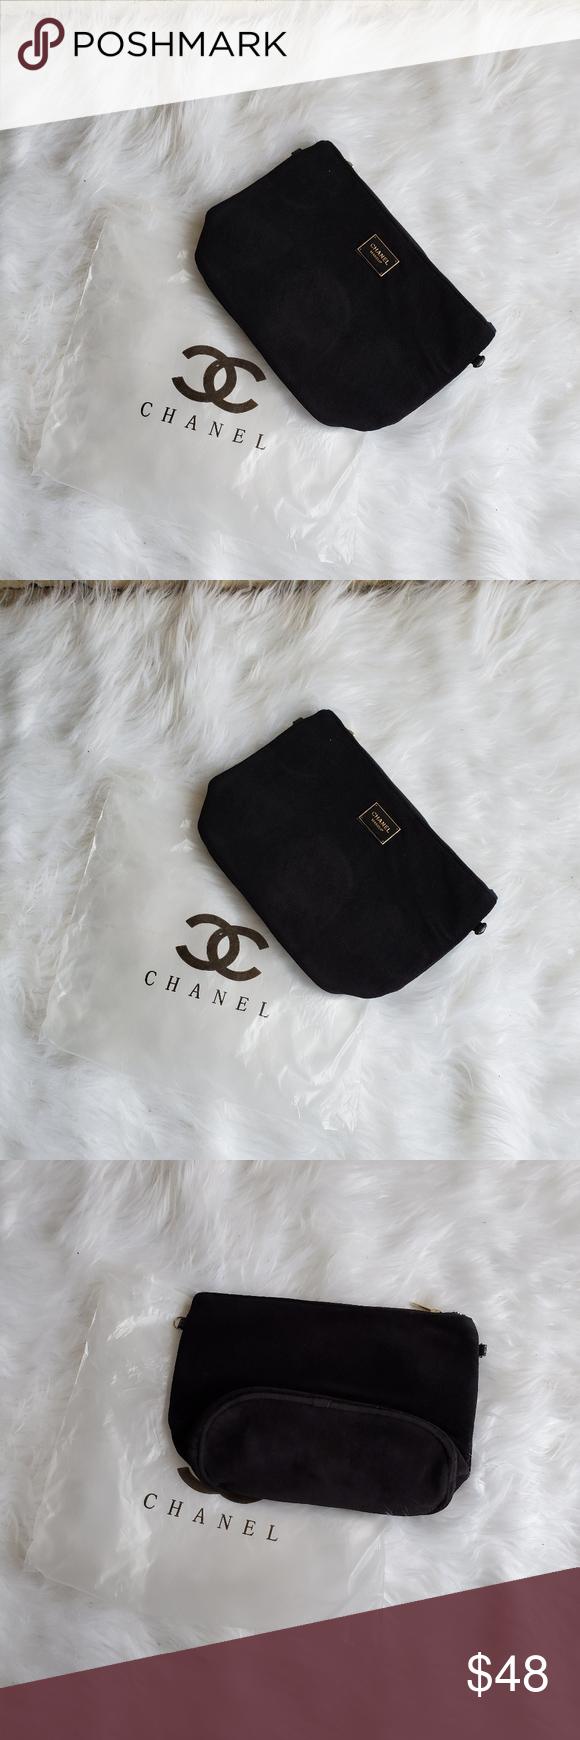 NEW CHANEL Black Velvet Makeup Bag with Gold CHANEL Black